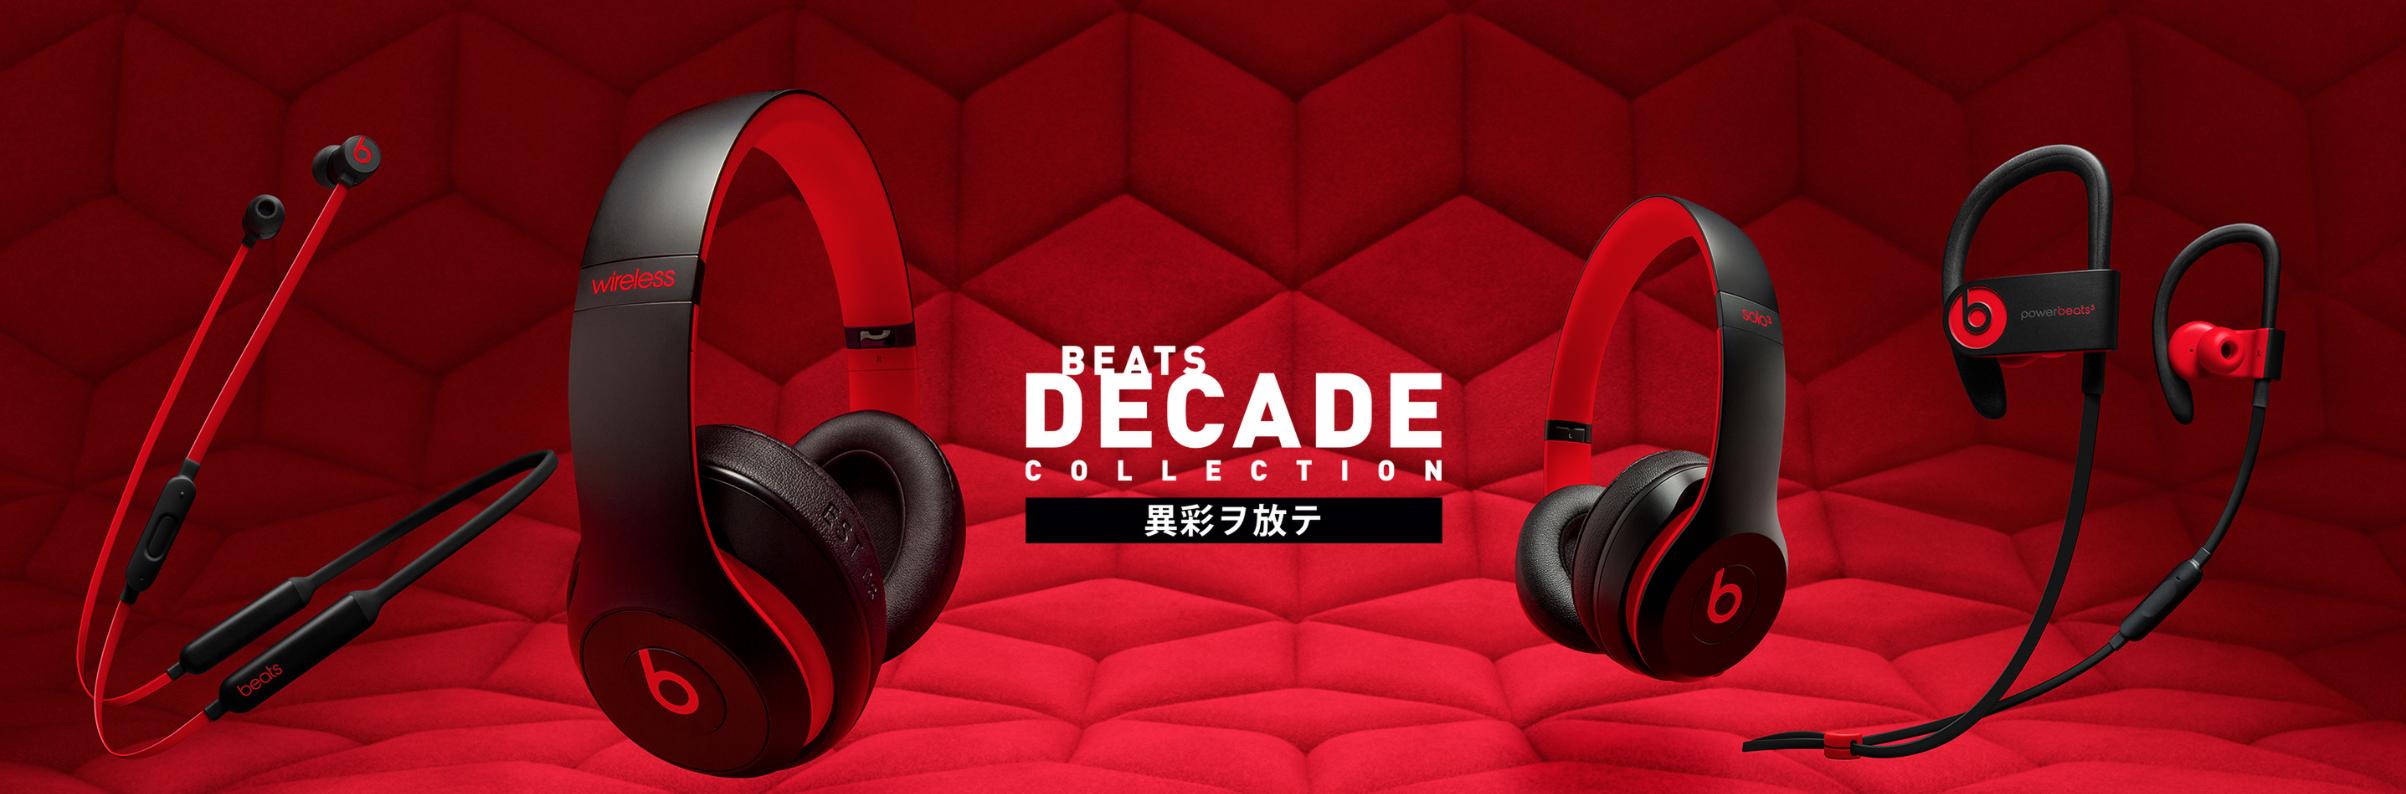 Beats発売10周年記念の製品5つ全てを見ていこう!赤と黒のデザインがいけてます